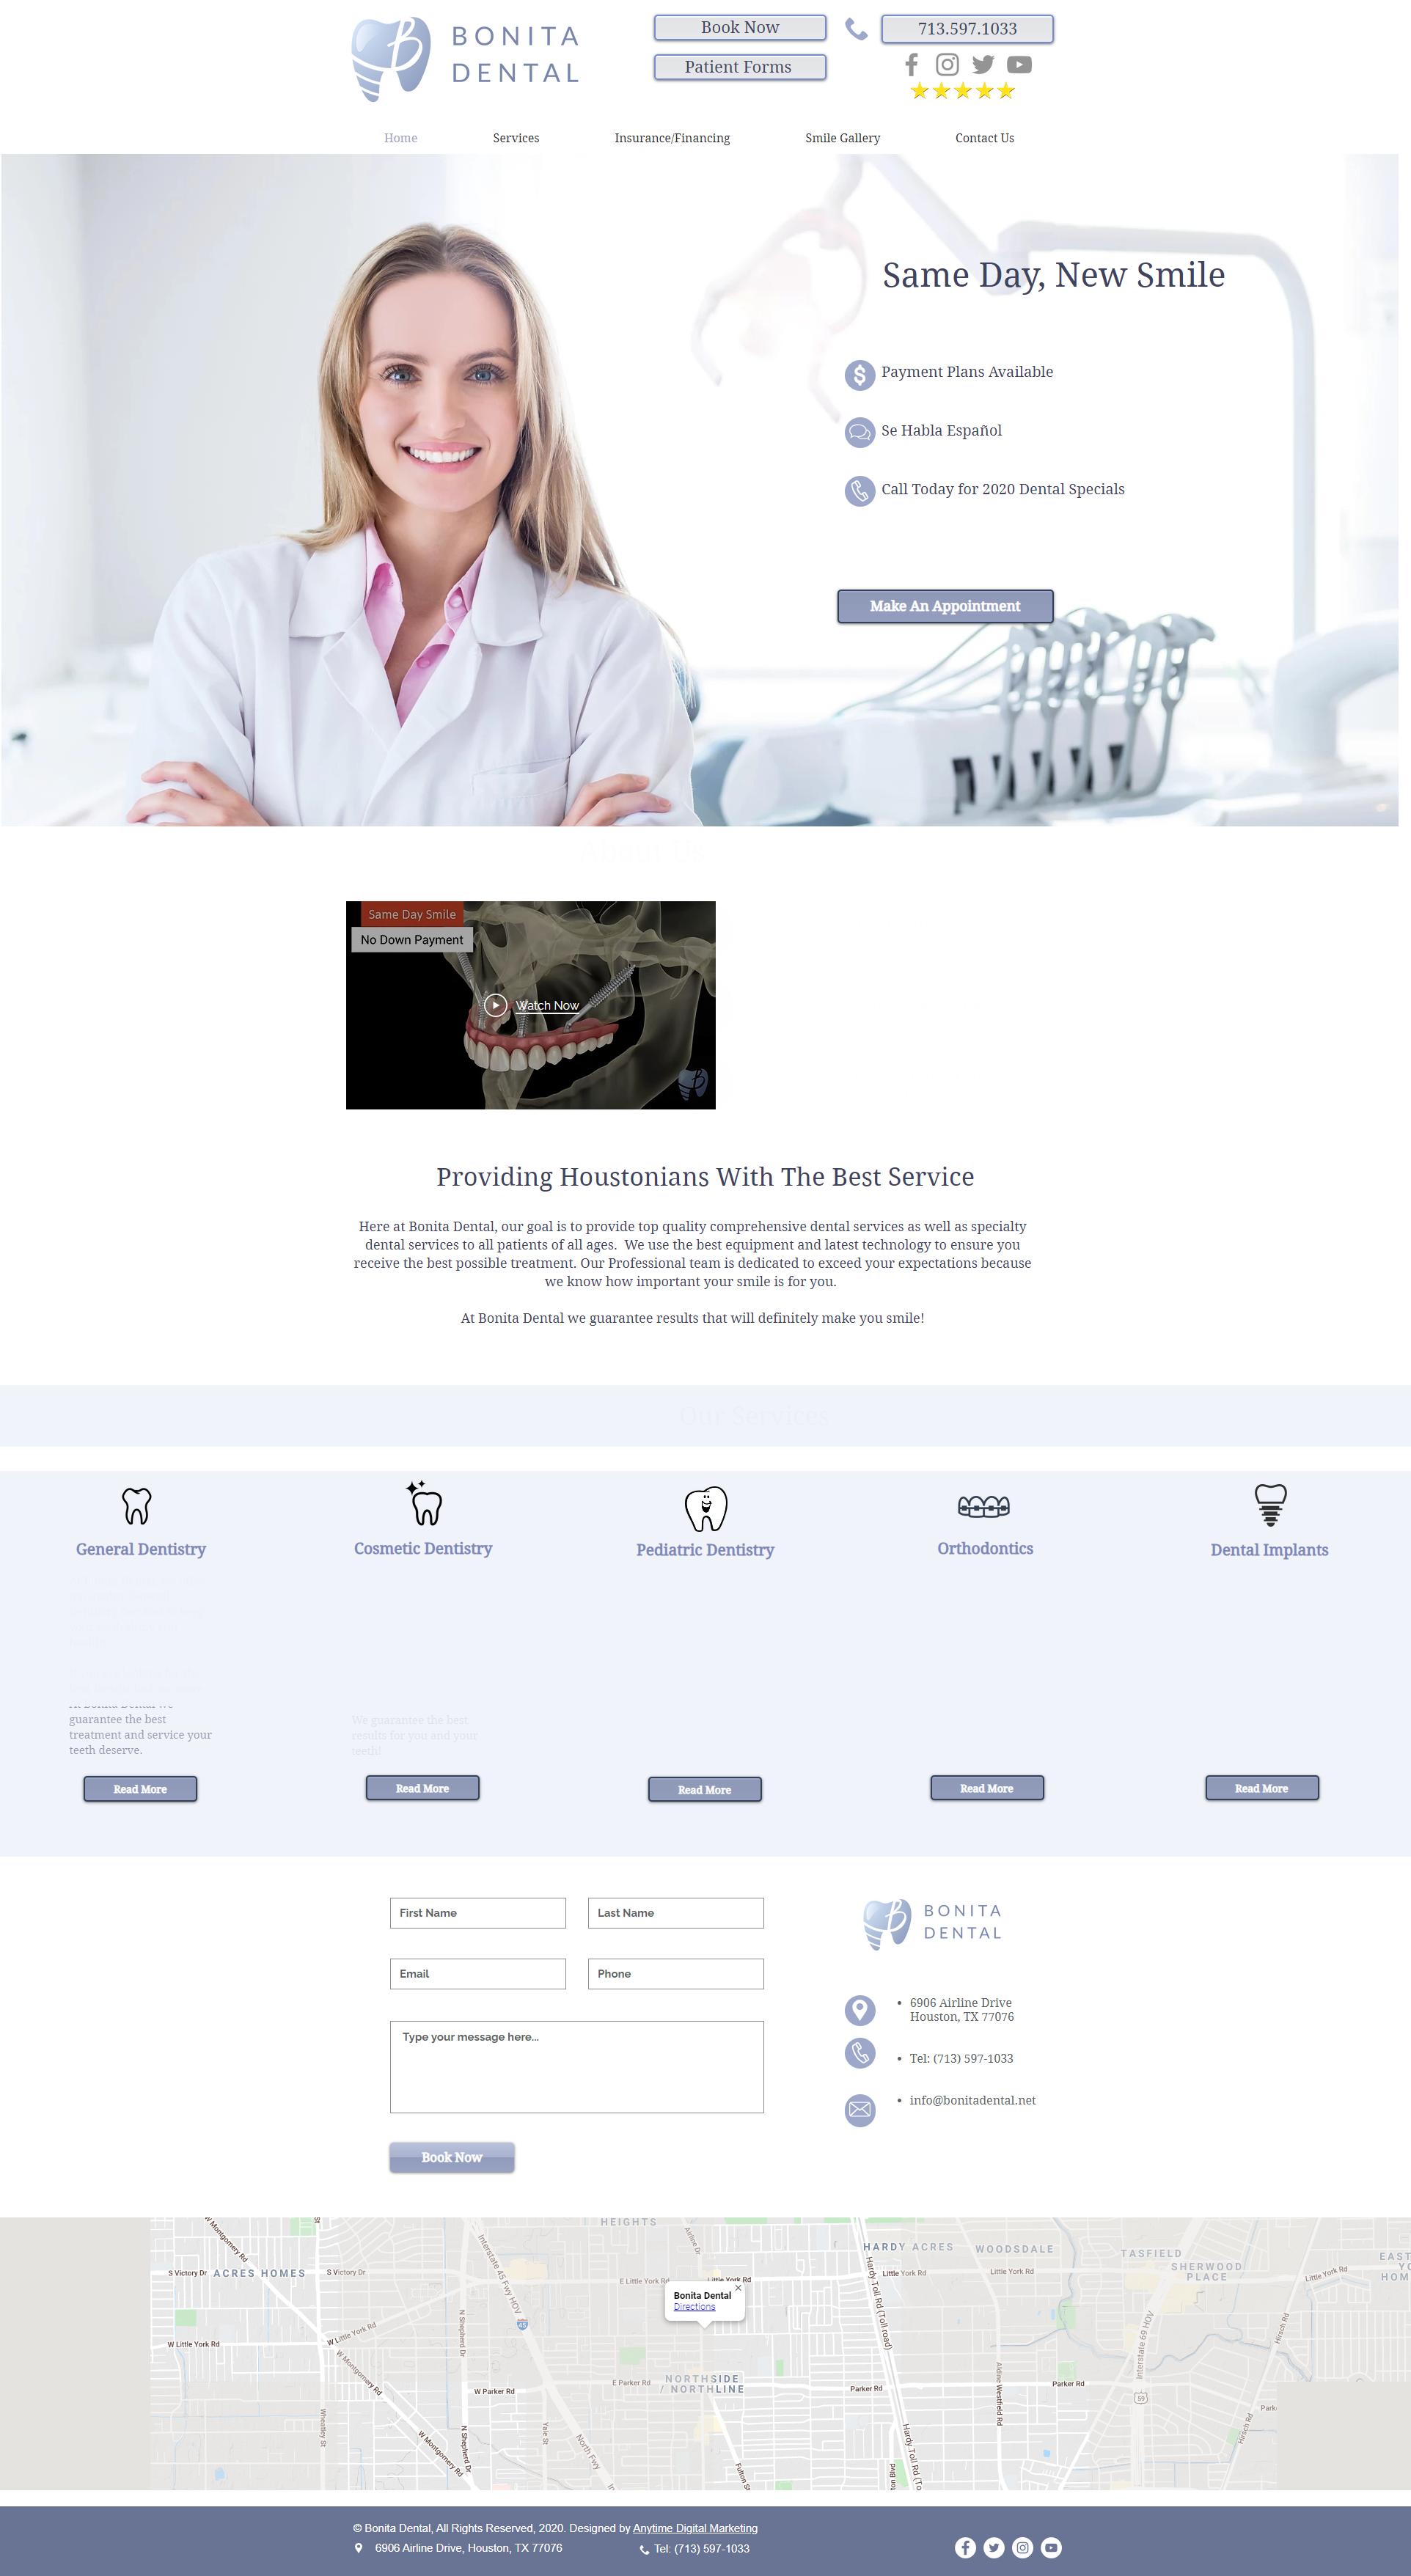 Bonita Dental Houston website design